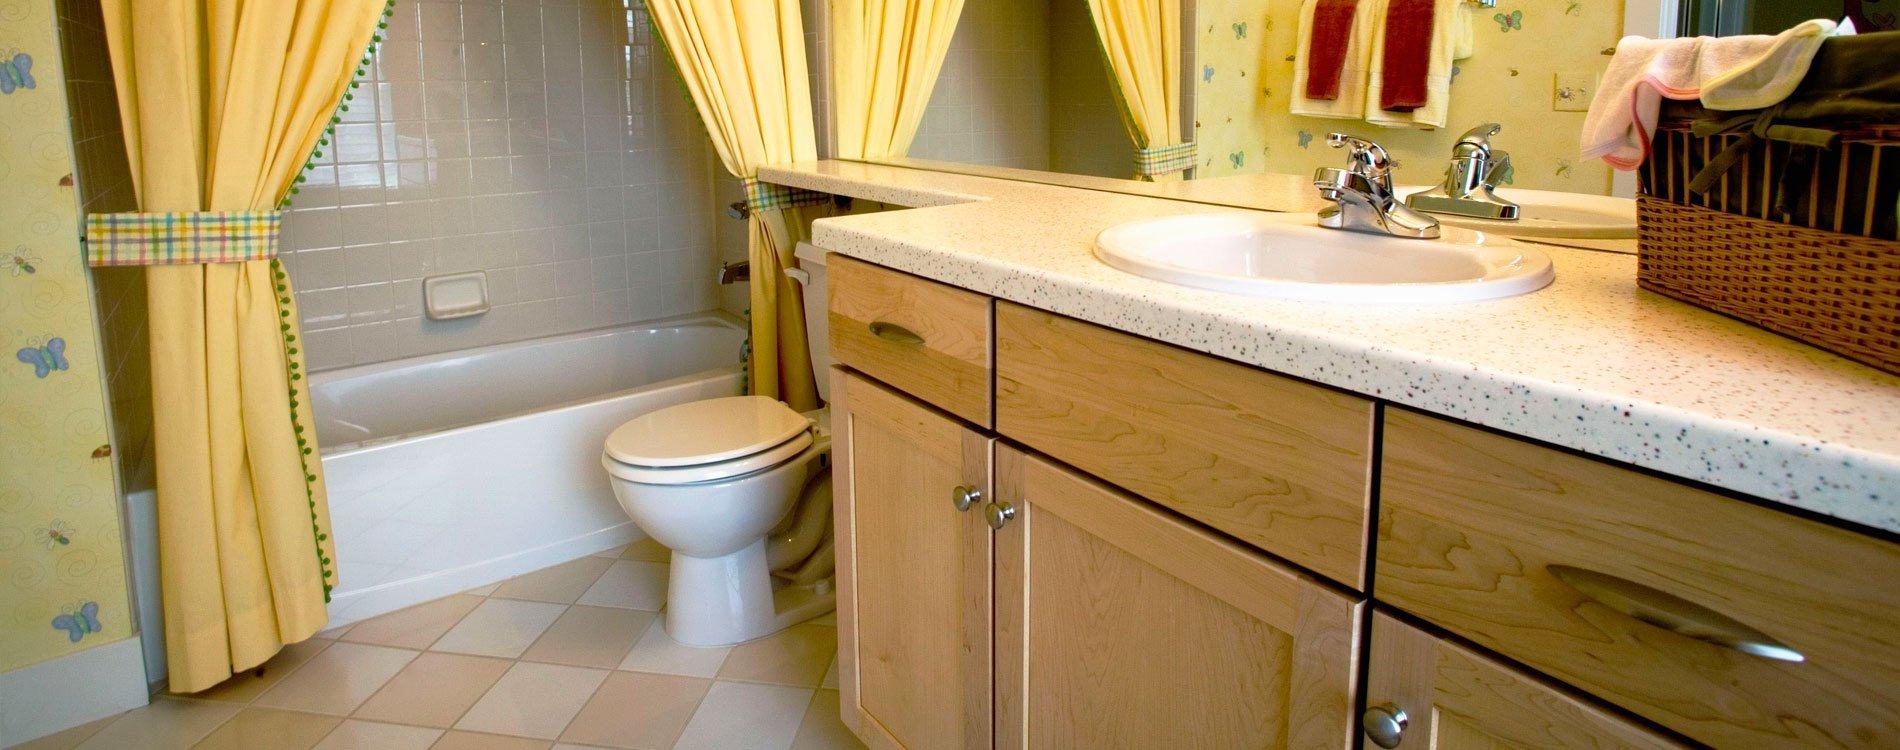 Custom Bathroom Vanities Philadelphia unique designsmichael a. del bonifro | remodeling philadelphia